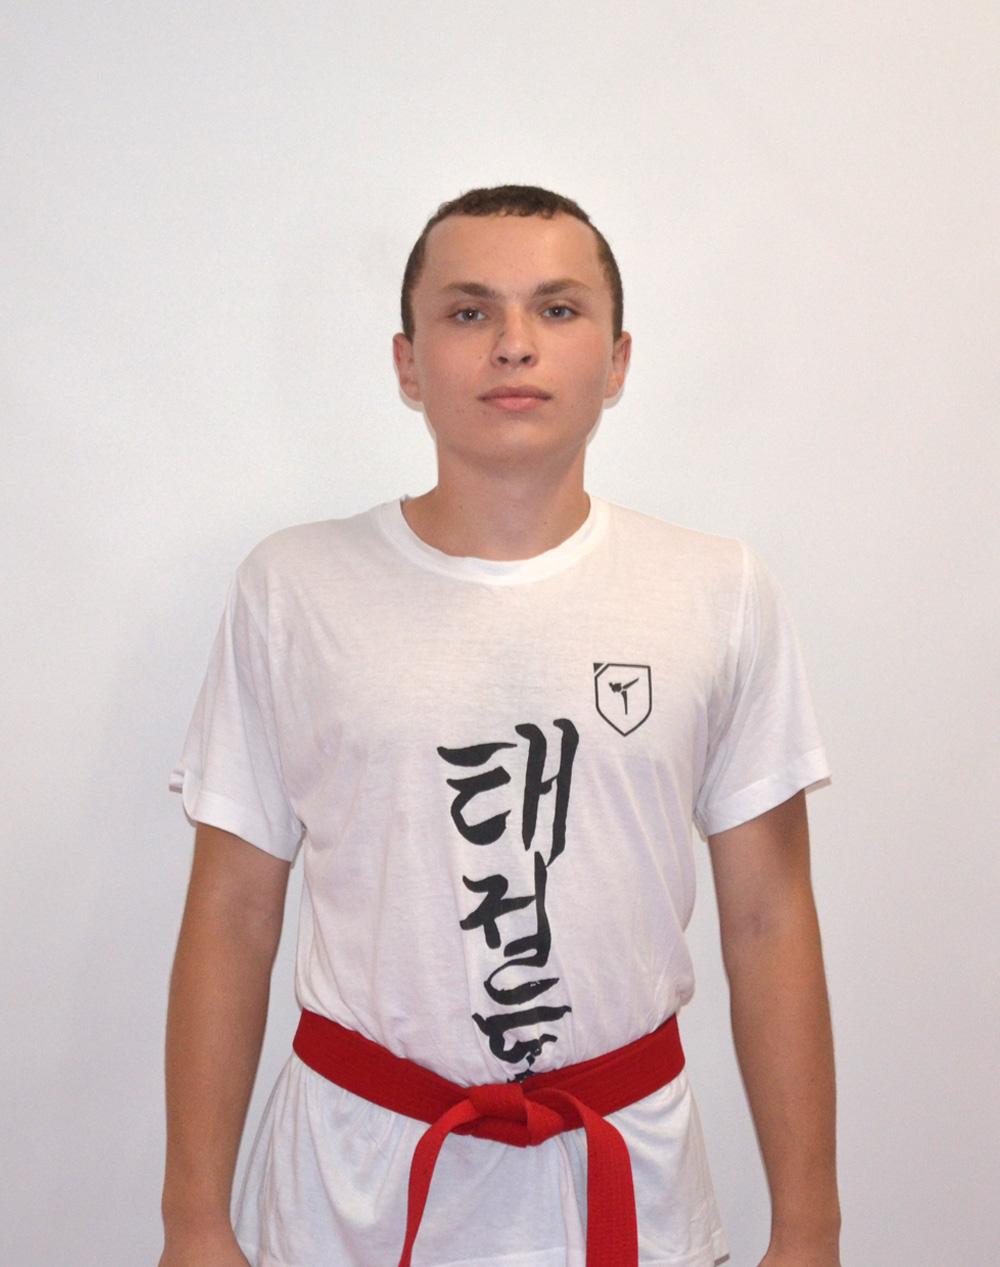 Dominik Kuvik